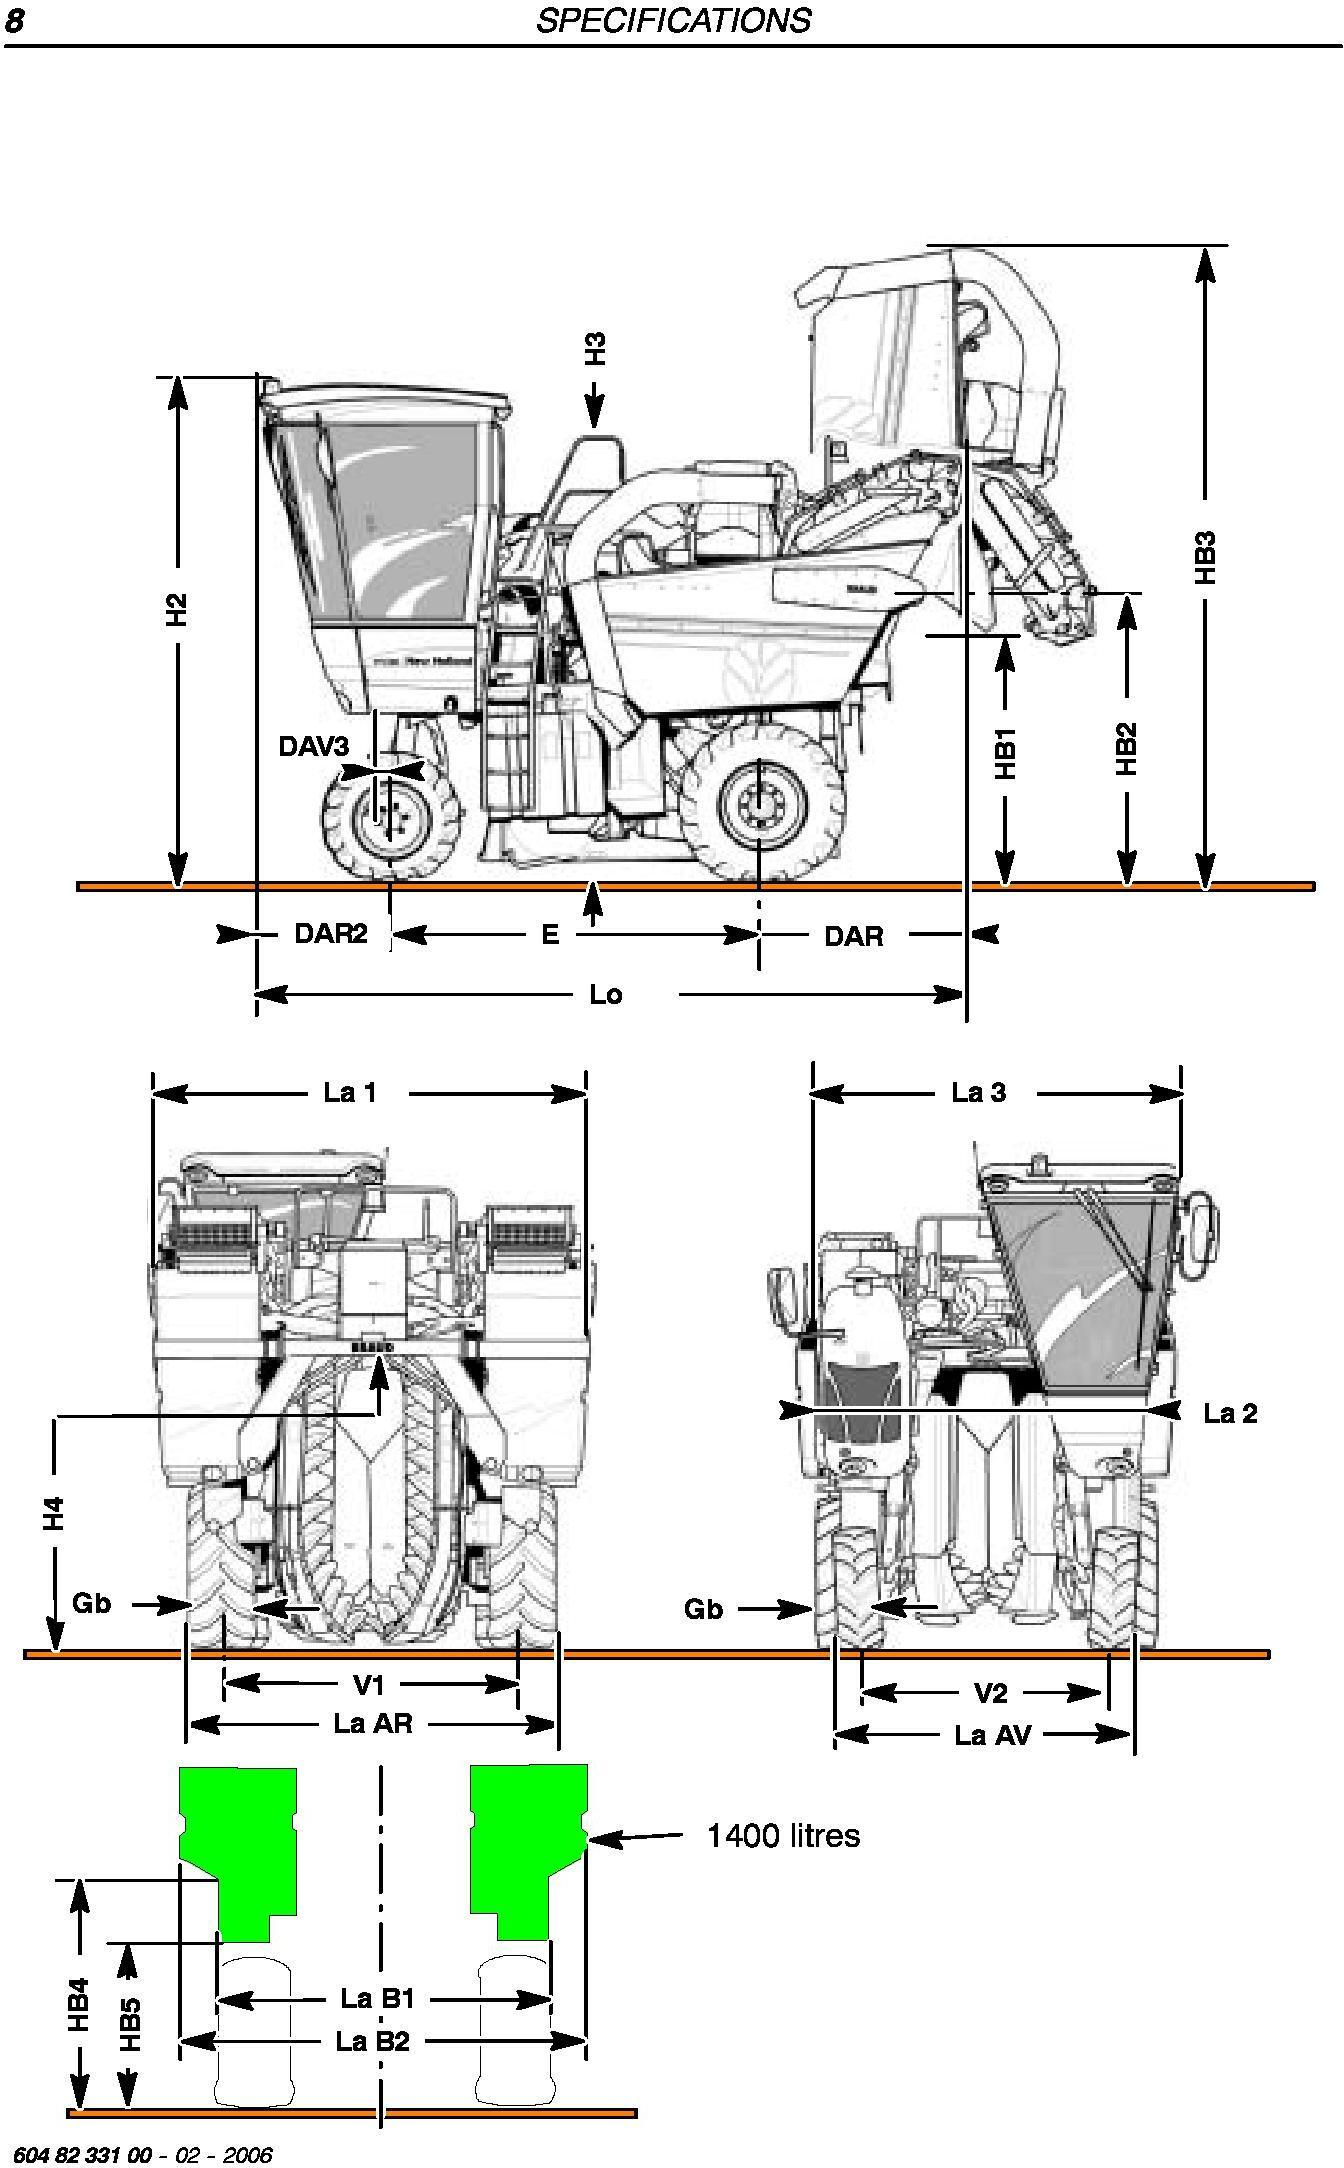 New Holland VL570,VL600,VL610,VL620,VL630,VL640,VL660, VM370,VM460,VN300 Grape Harvester Service Manual - 1